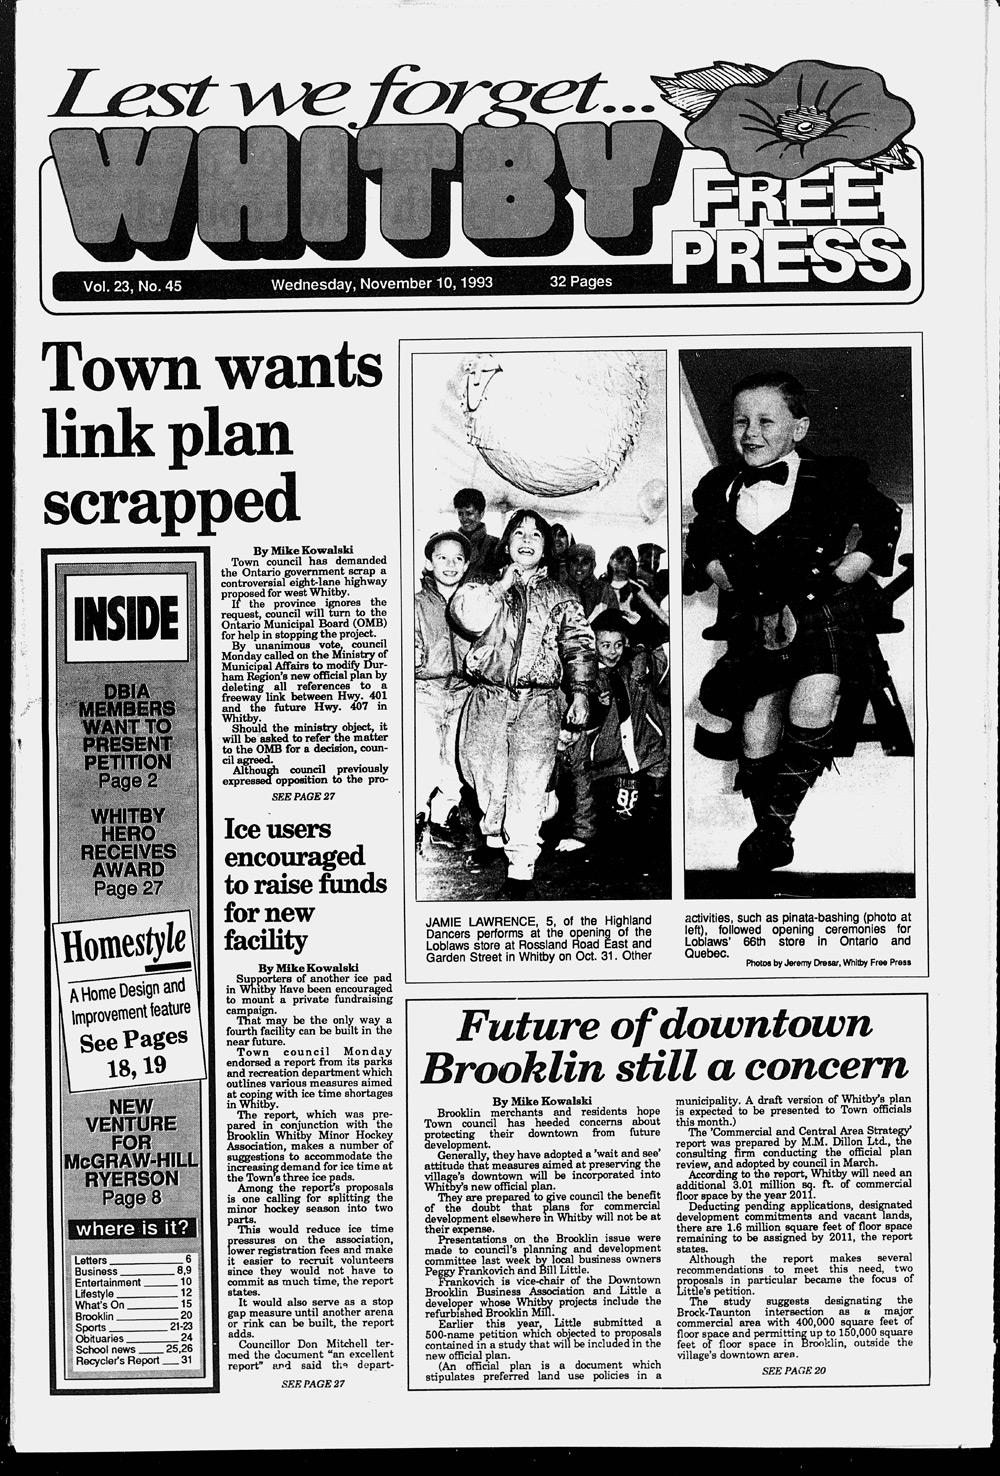 Whitby Free Press, 10 Nov 1993